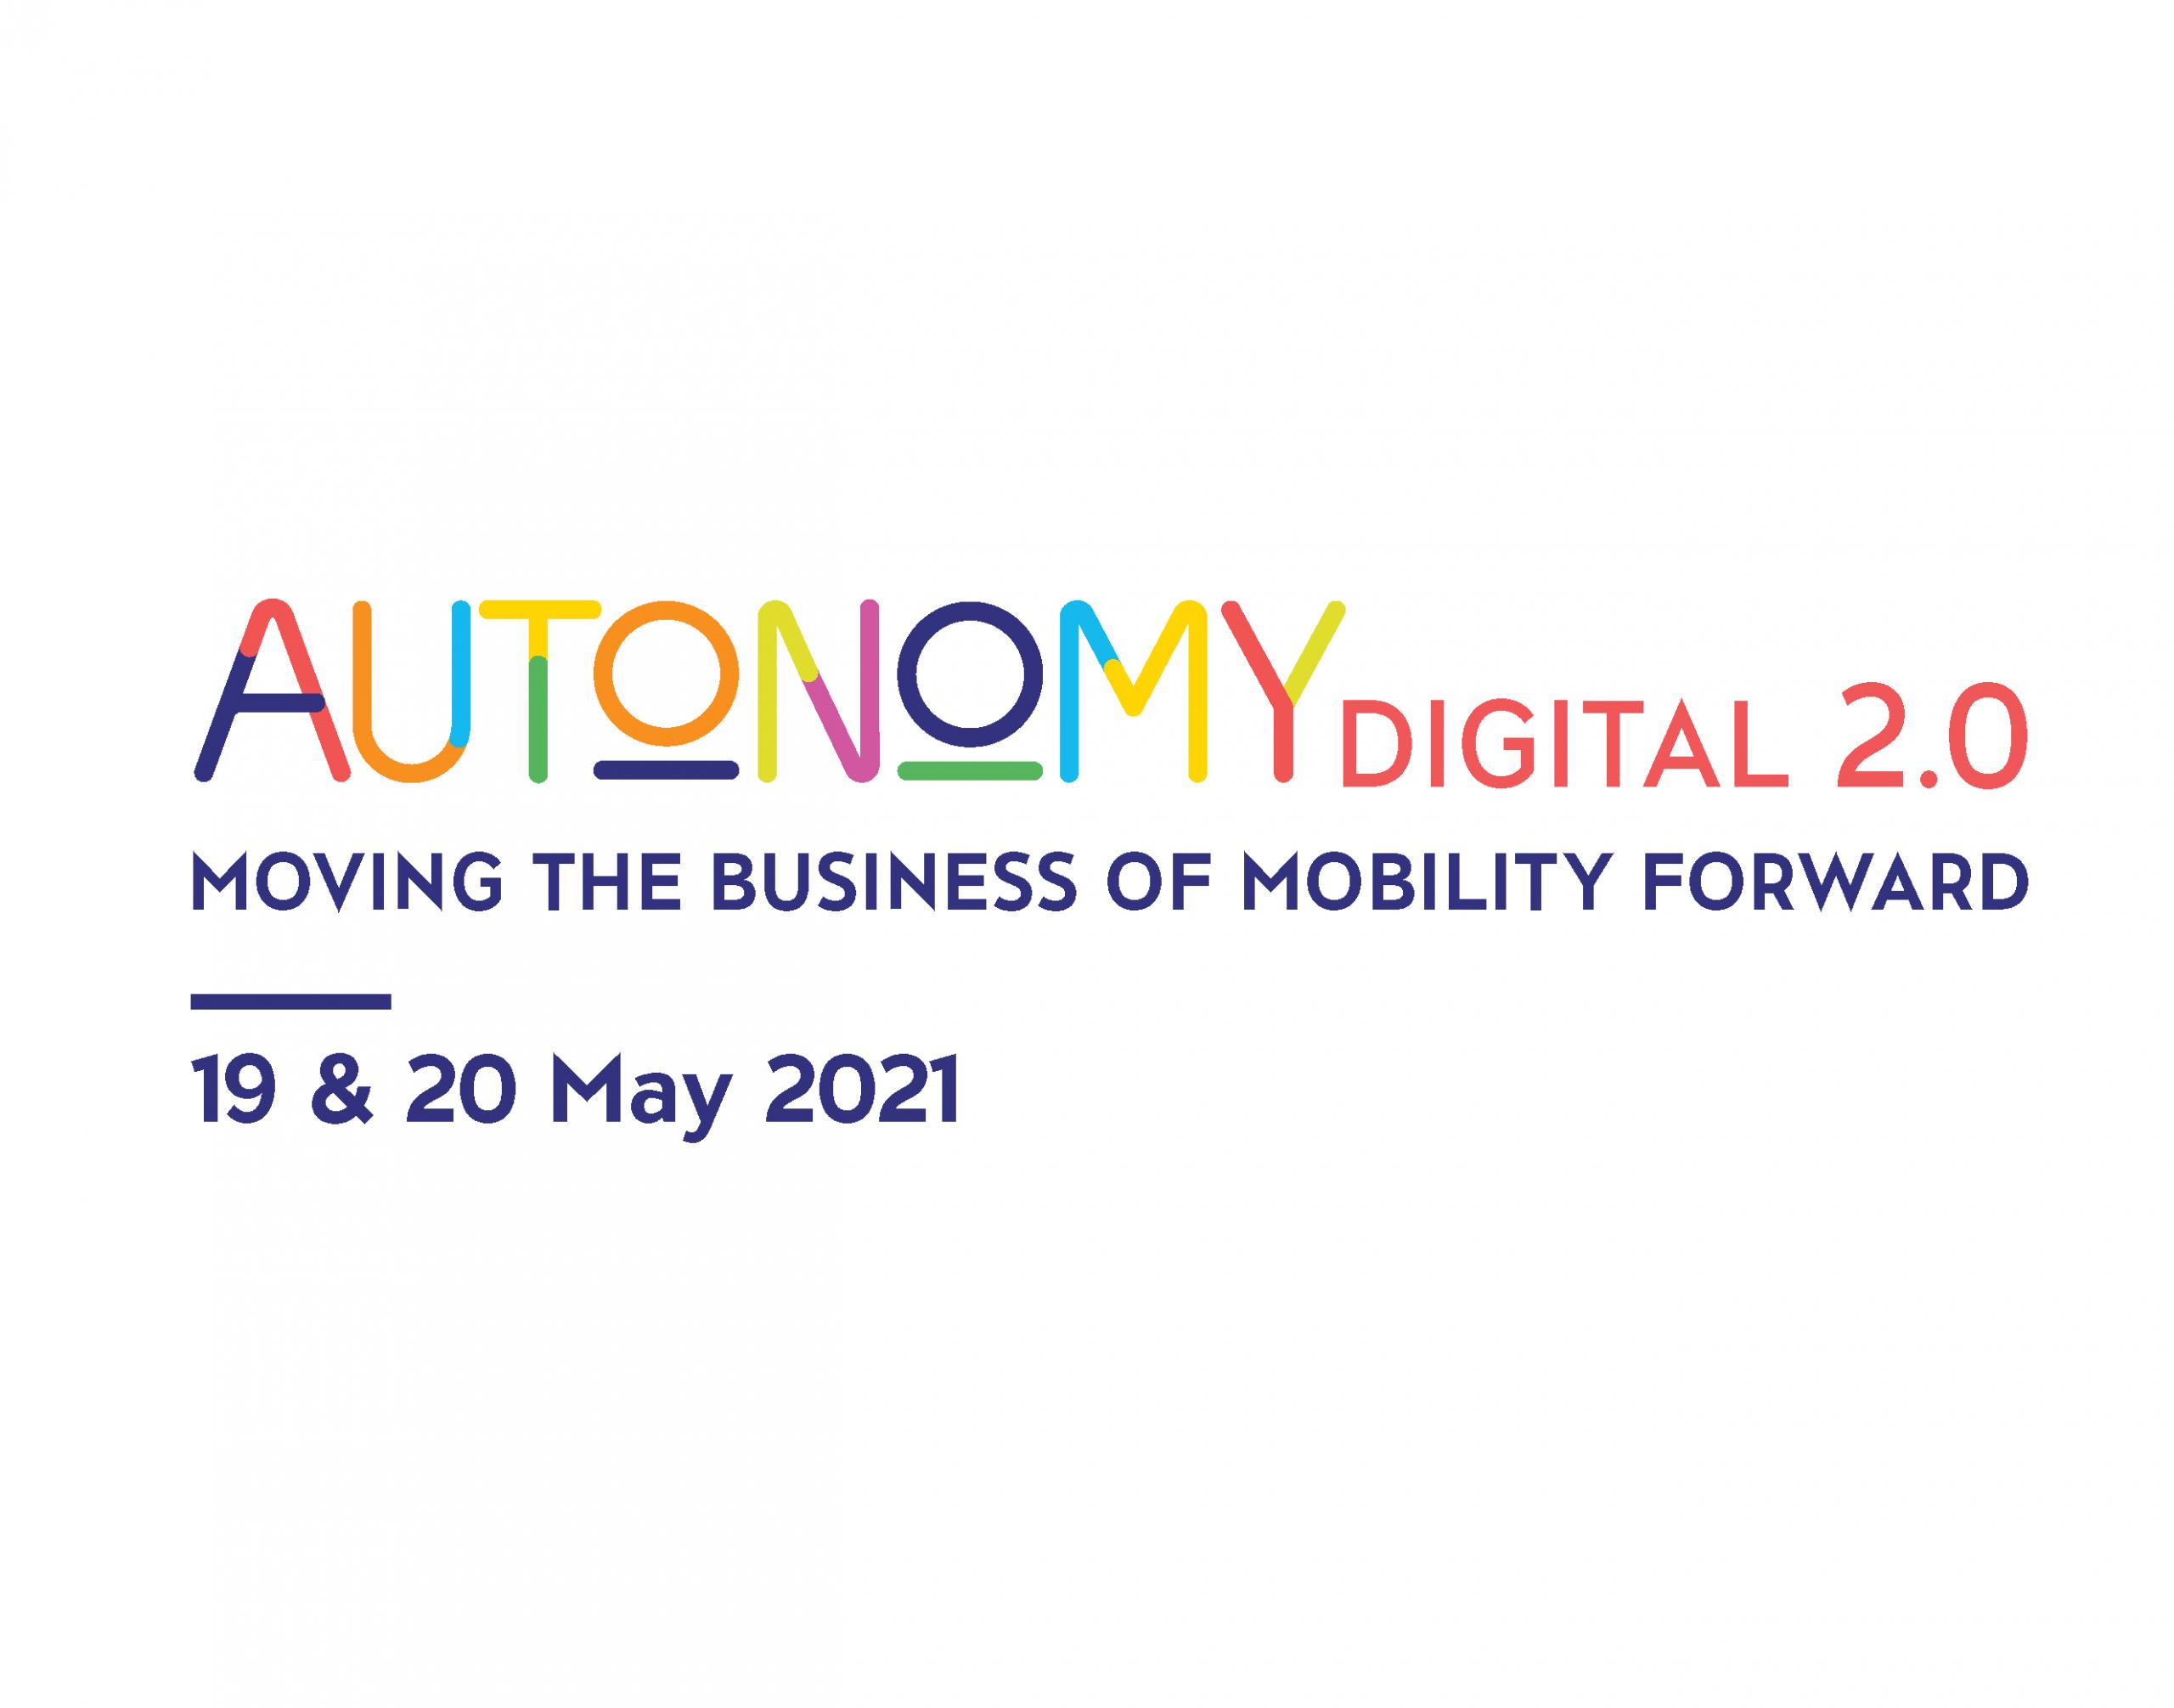 Autonomy Digital 2.0 x Velco